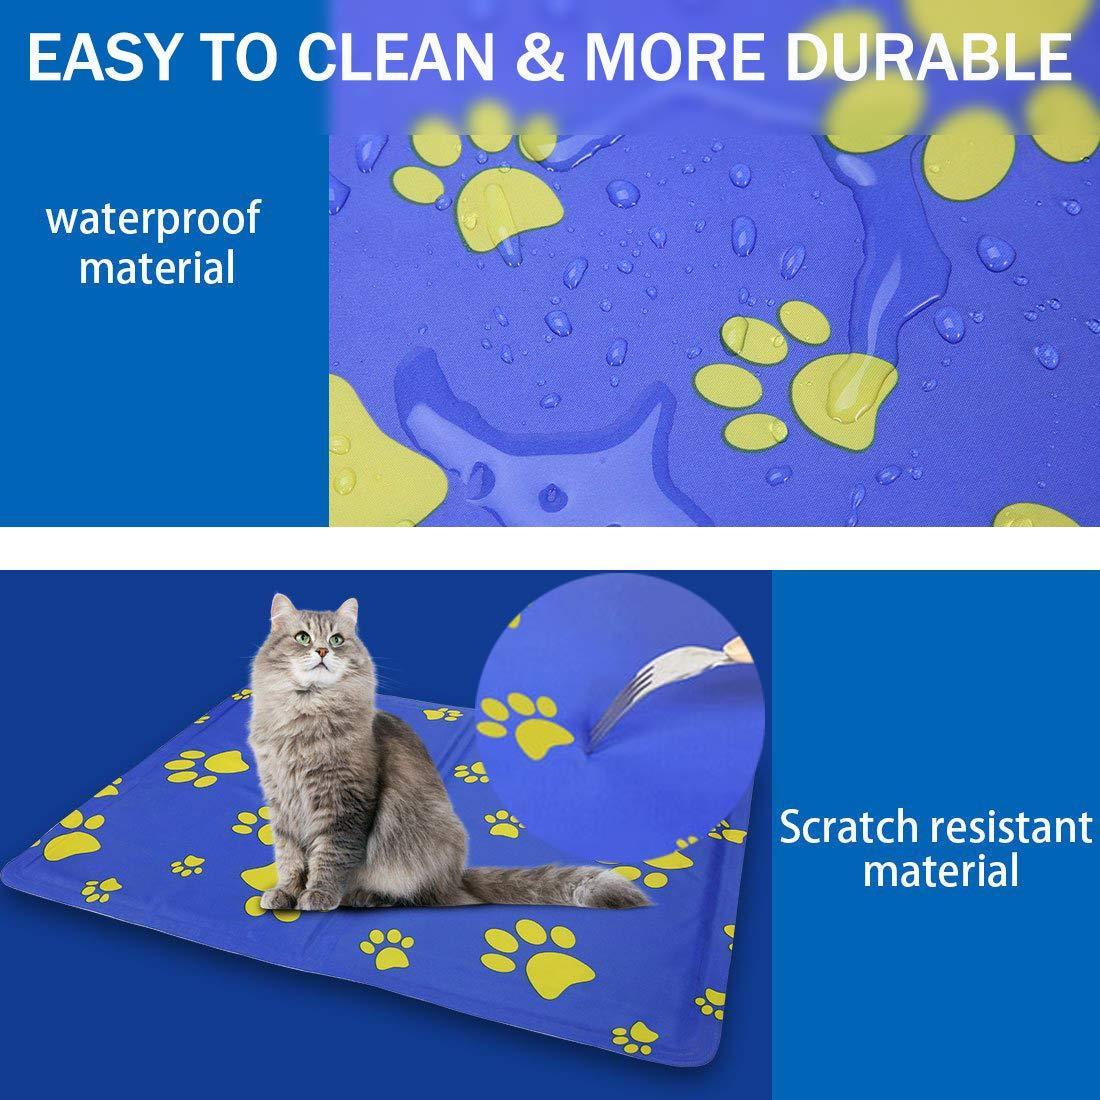 Grande Raffreddamento Pad /& Sleep Well 90/cm x50/cm PRO Gel di Raffreddamento Goleem Self Pet Mat per Puppy Dog /& Cat